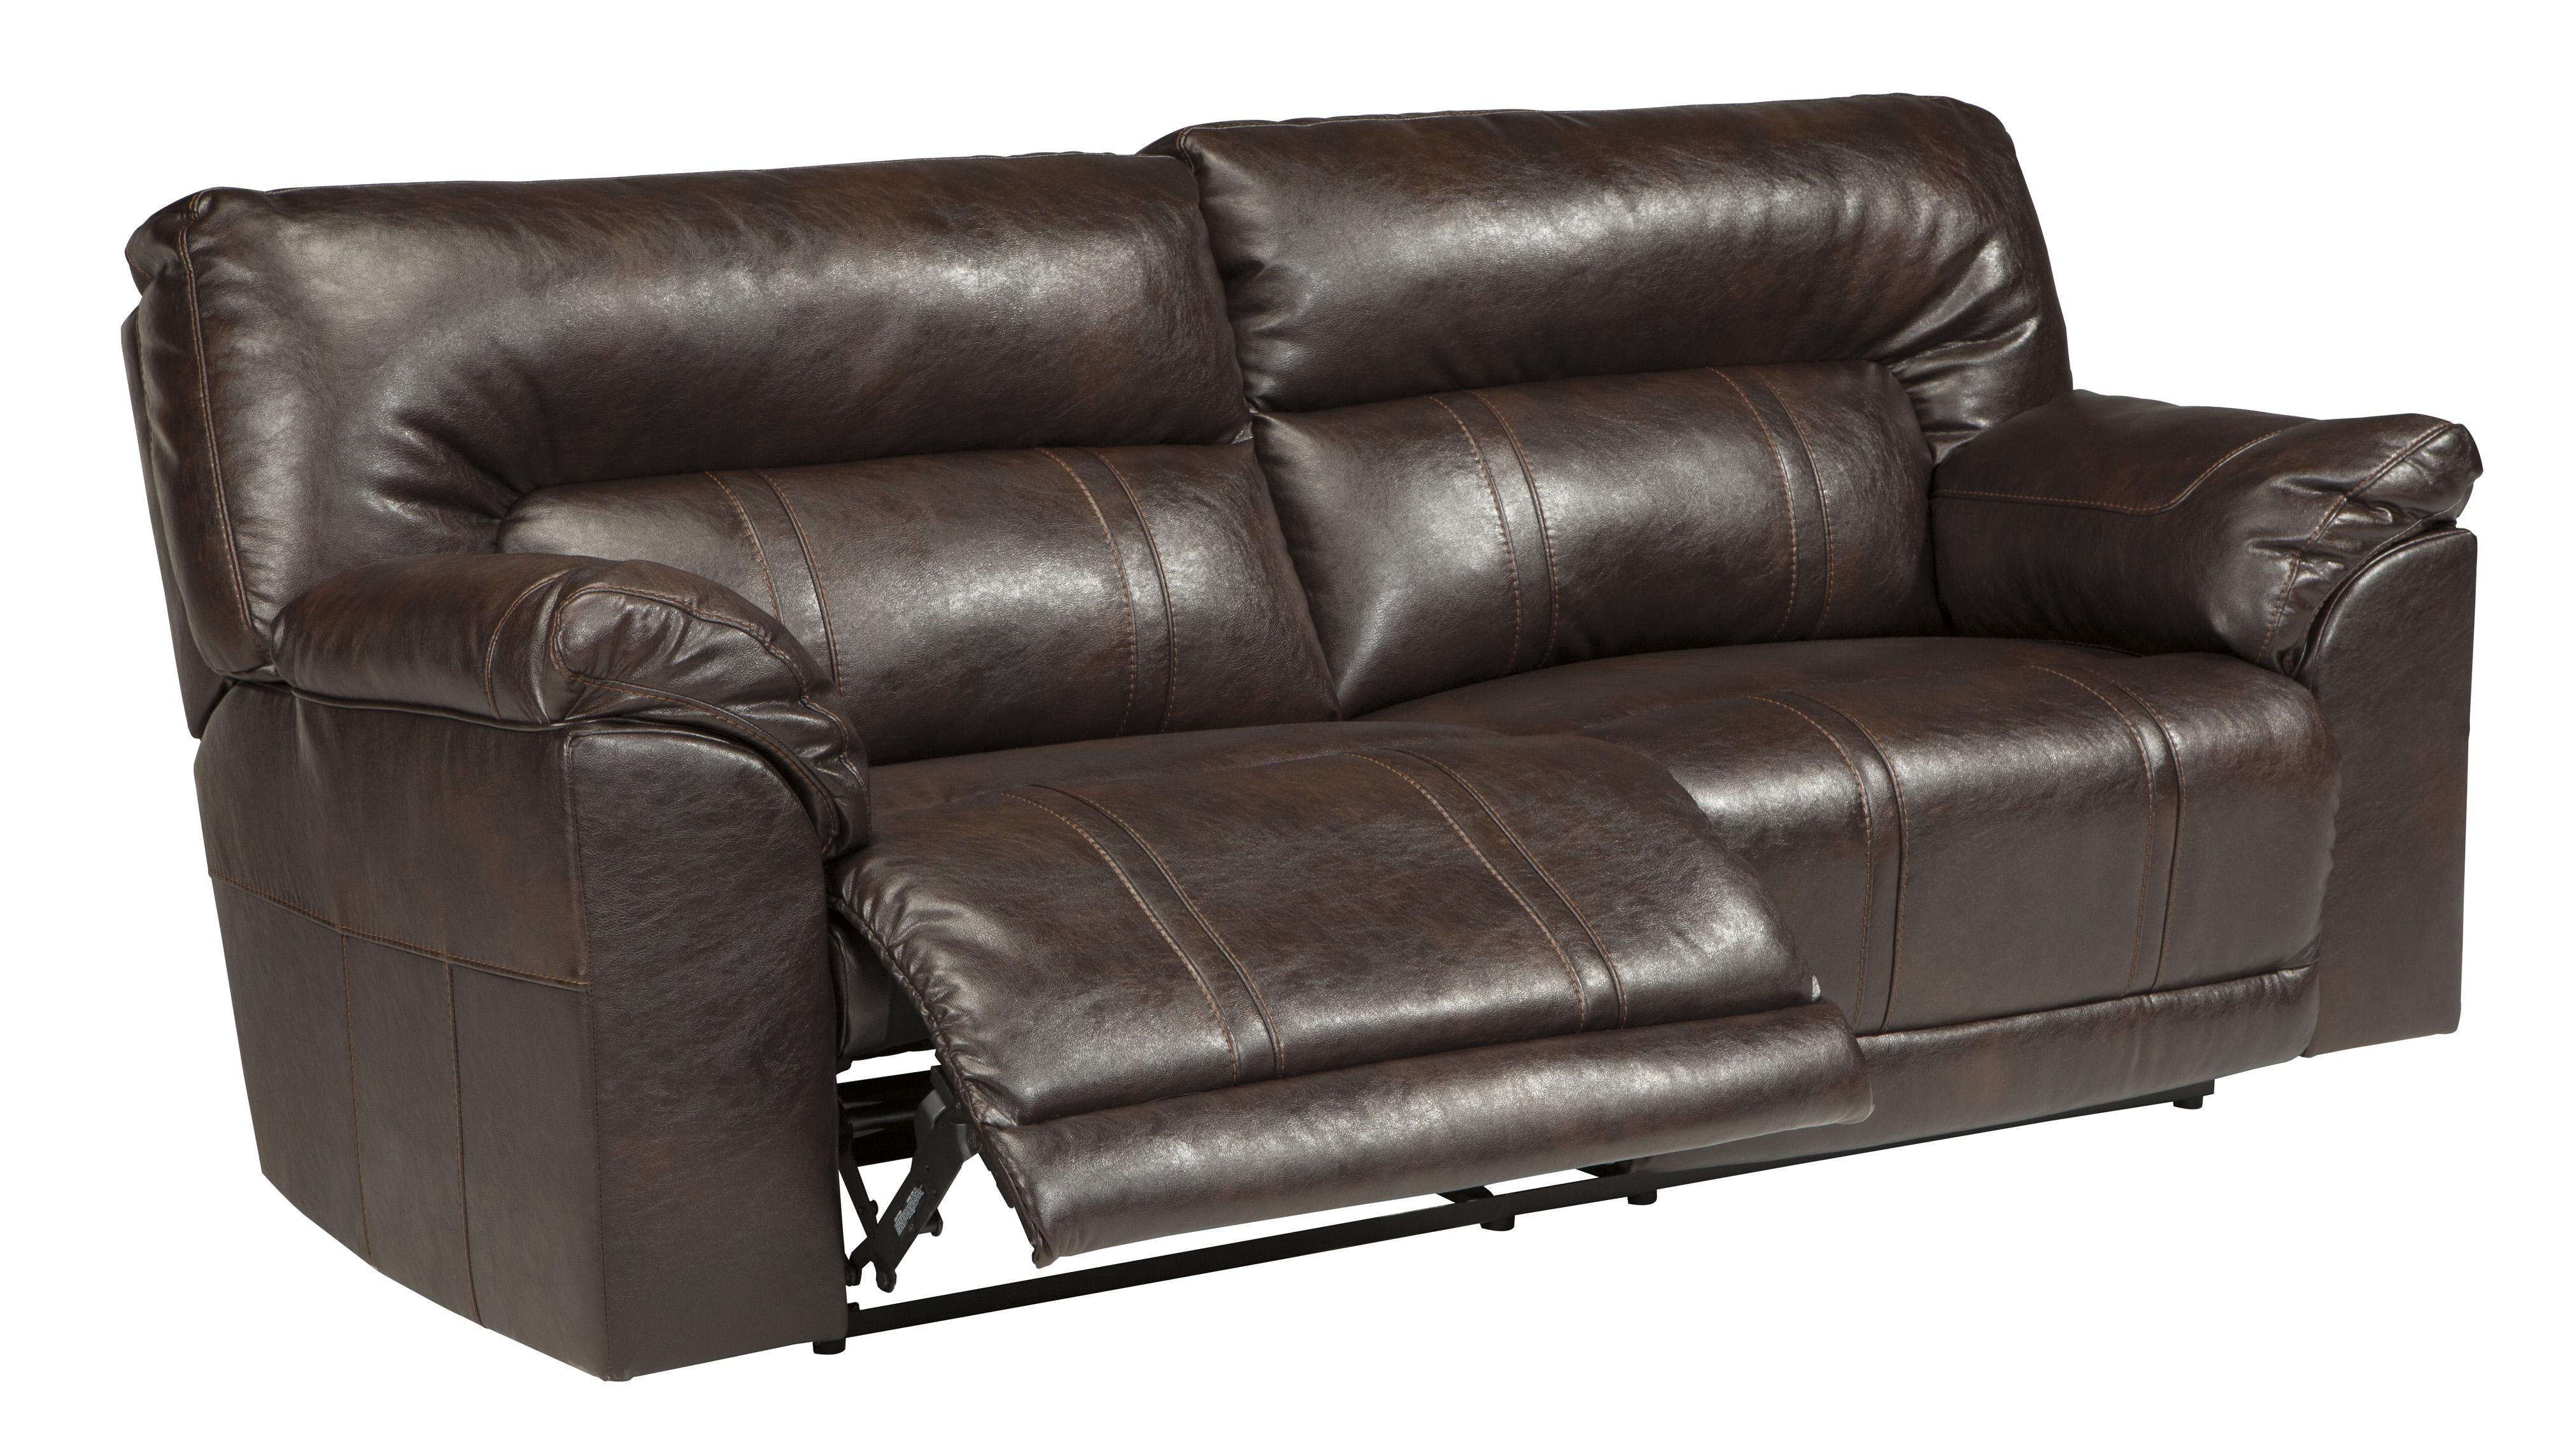 Furniture Extreme Calgary Barrettsville Durablend 174 Seat